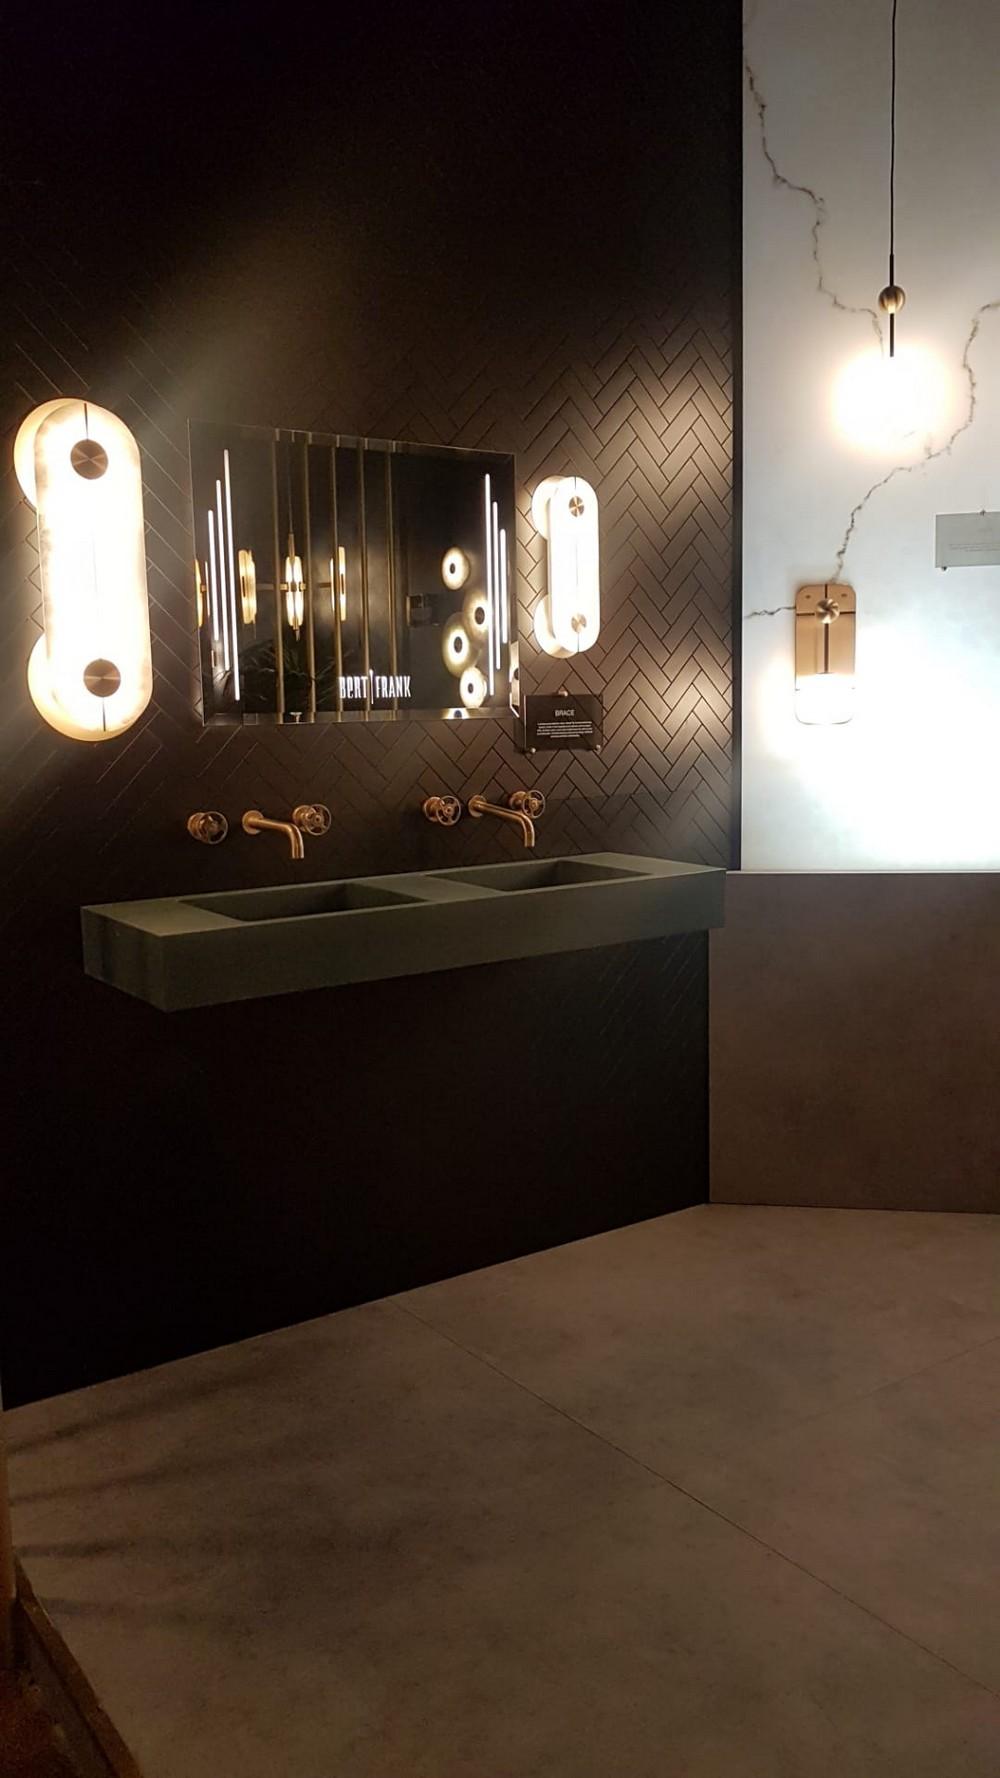 Maison et Objet Review One-of-a-Kind Furniture & Lighting Designs_4 maison et objet Maison et Objet Review: One-of-a-Kind Furniture & Lighting Designs Maison et Objet Review One of a Kind Furniture Lighting Designs 4